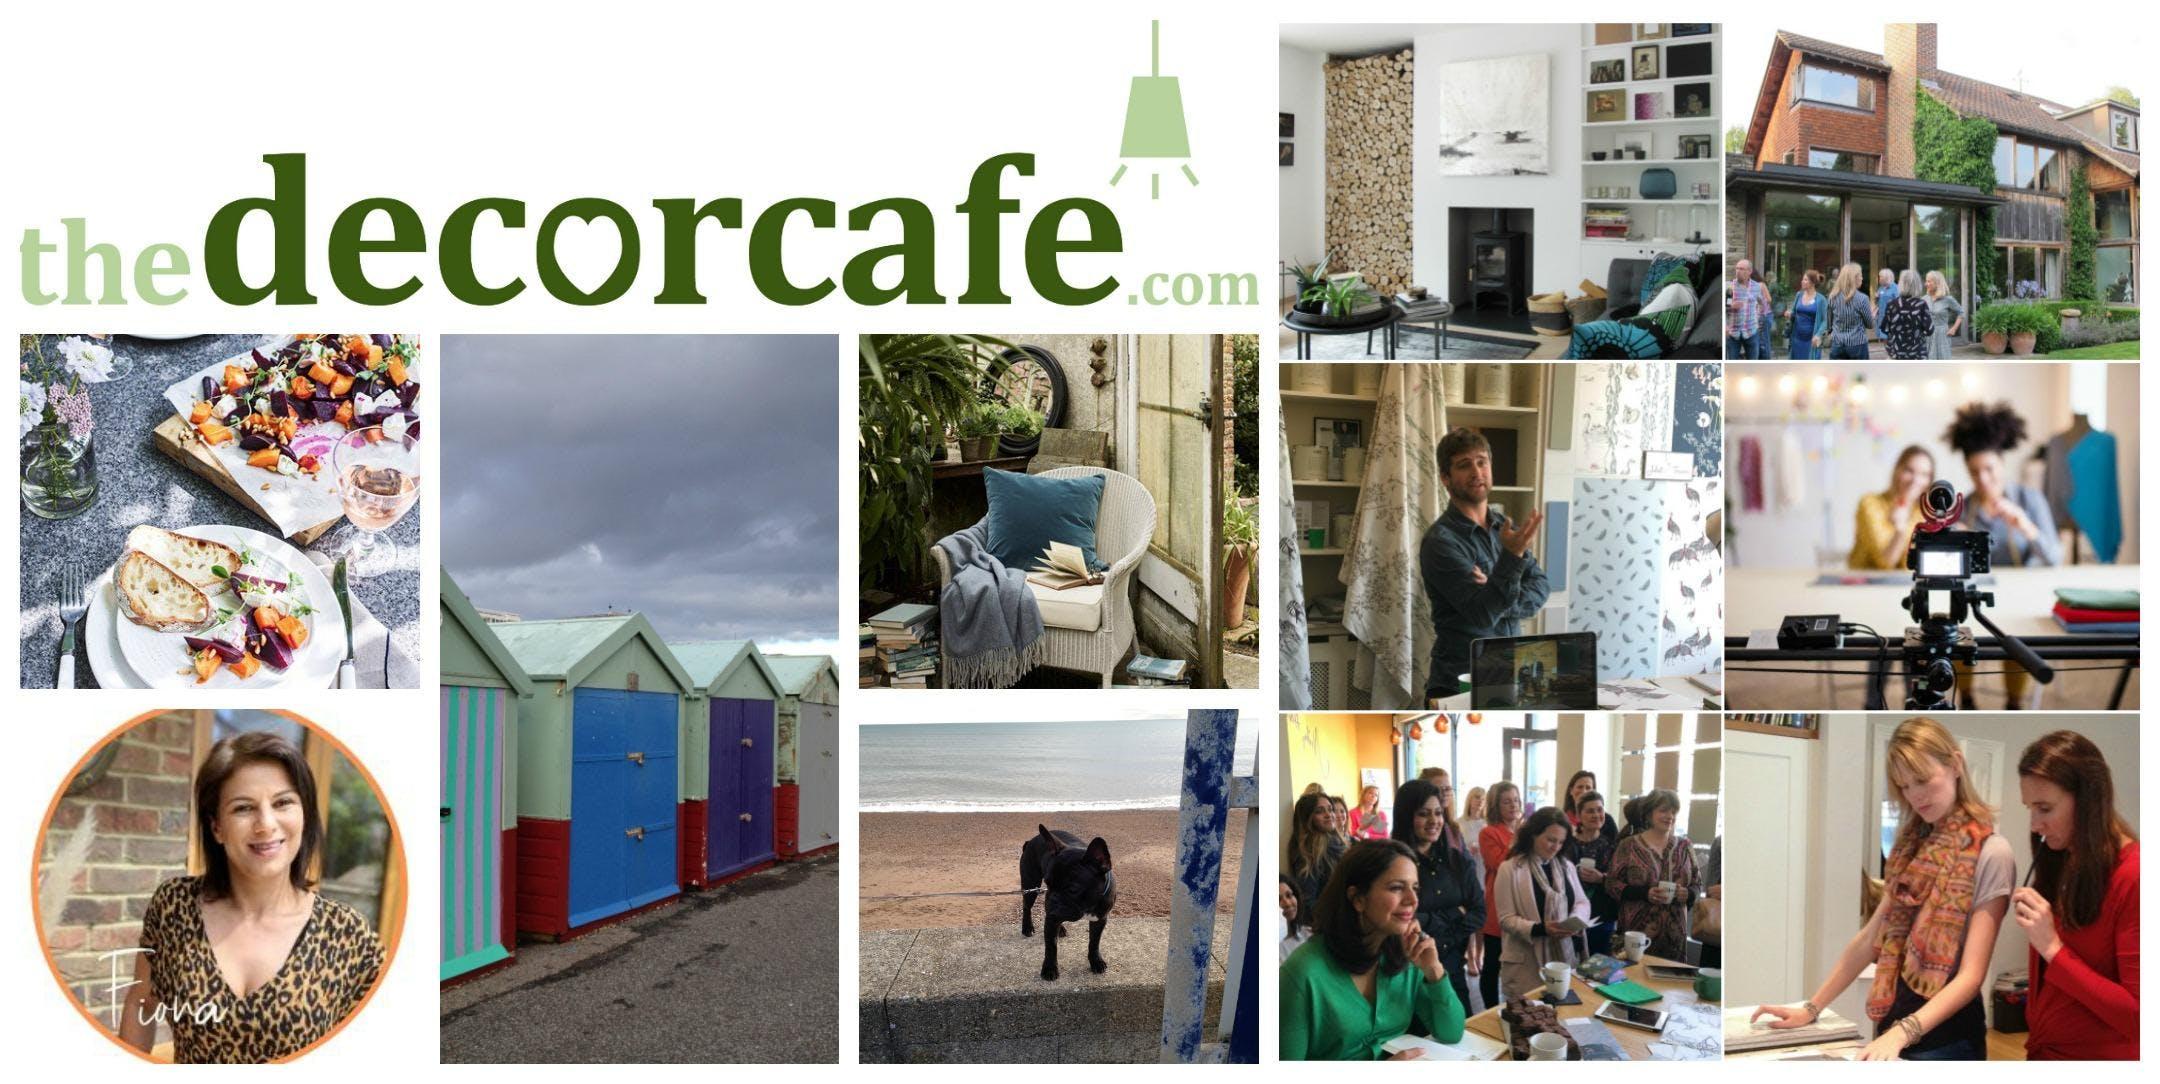 The Decorcafe Brighton Launch